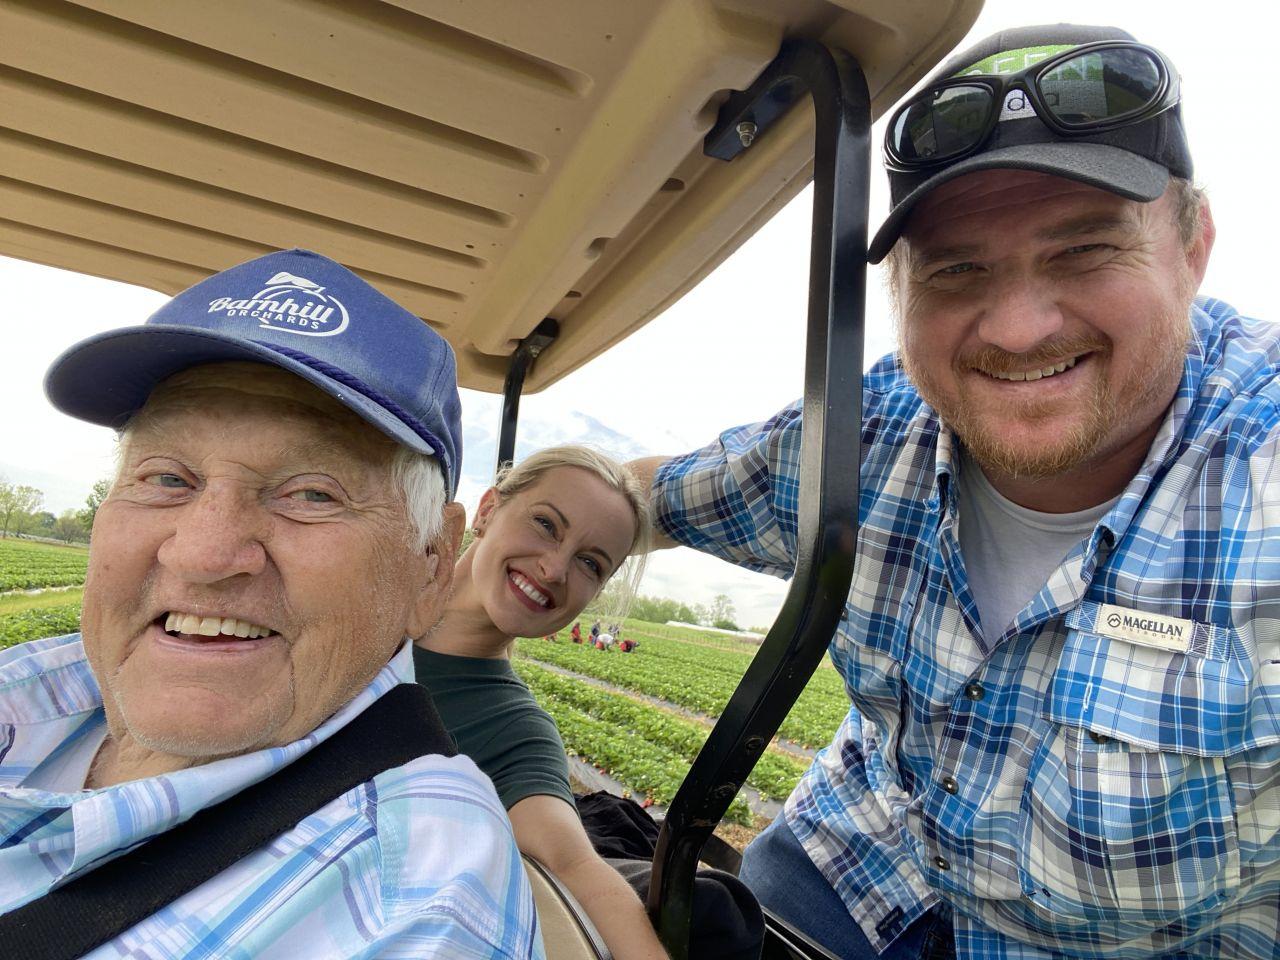 Morning golf cart ride selfie at Barnhill Orchards